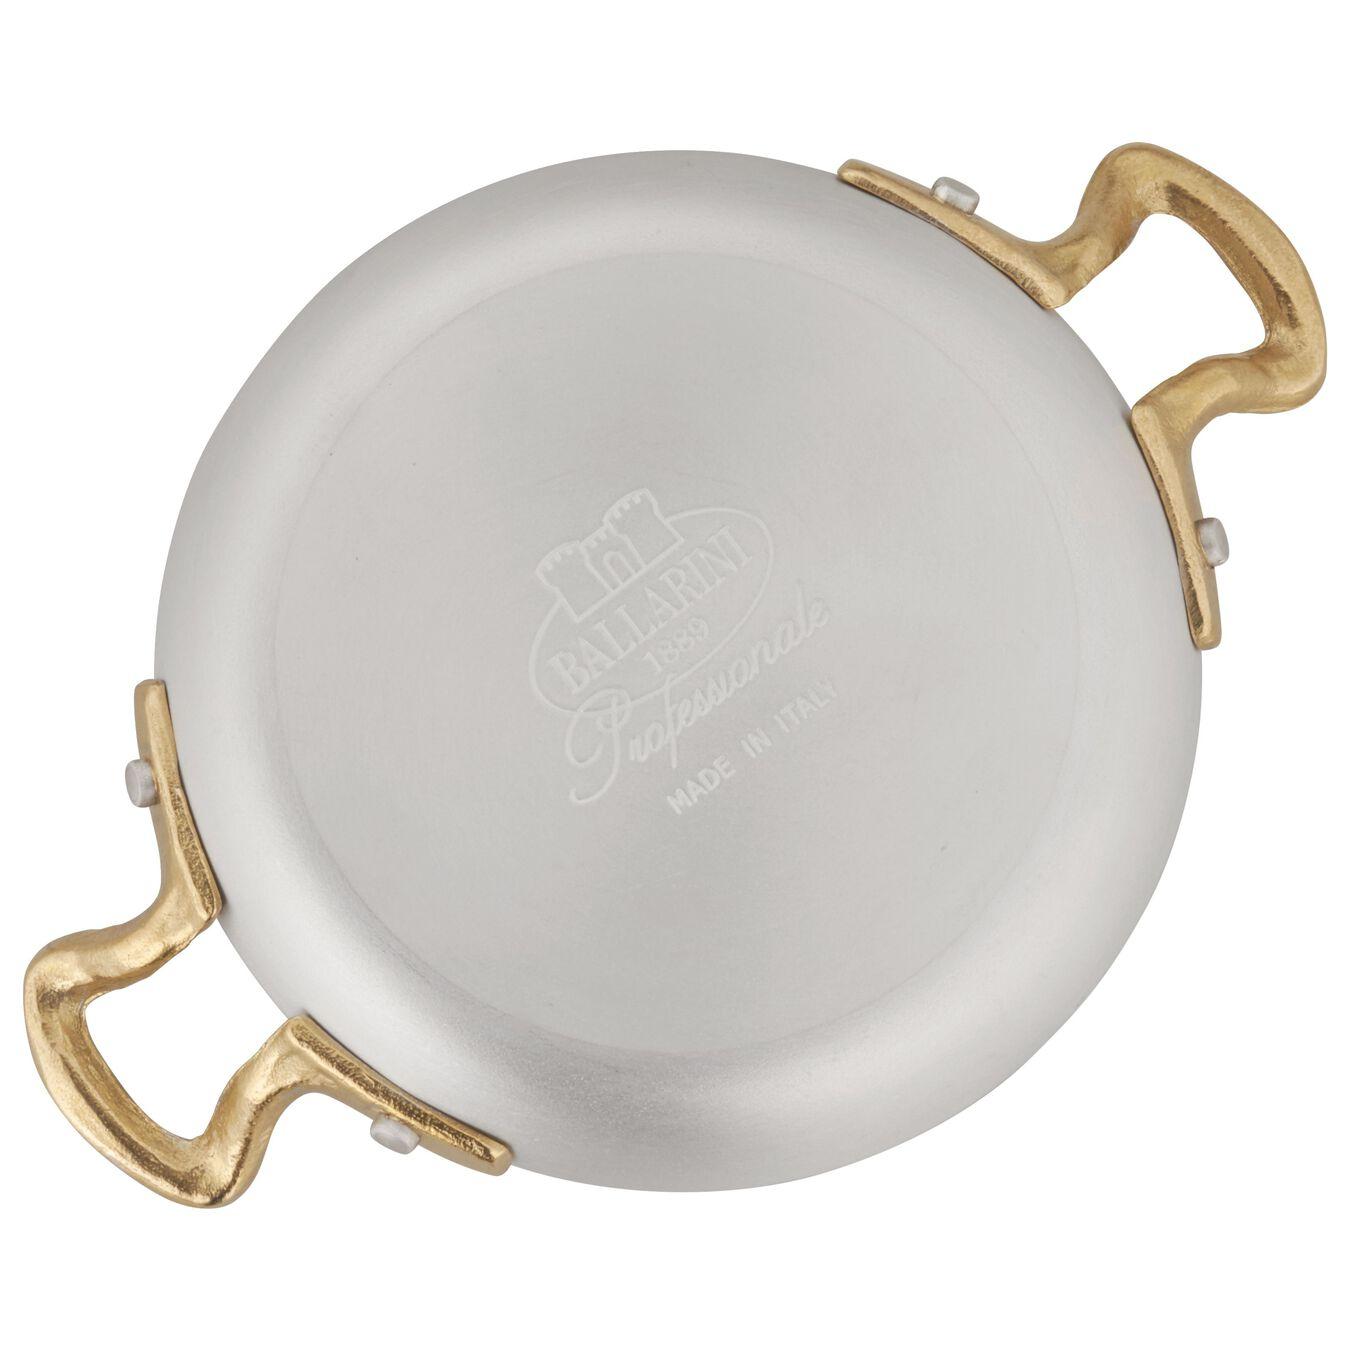 5.5-inch Mini Saute Pan,,large 5